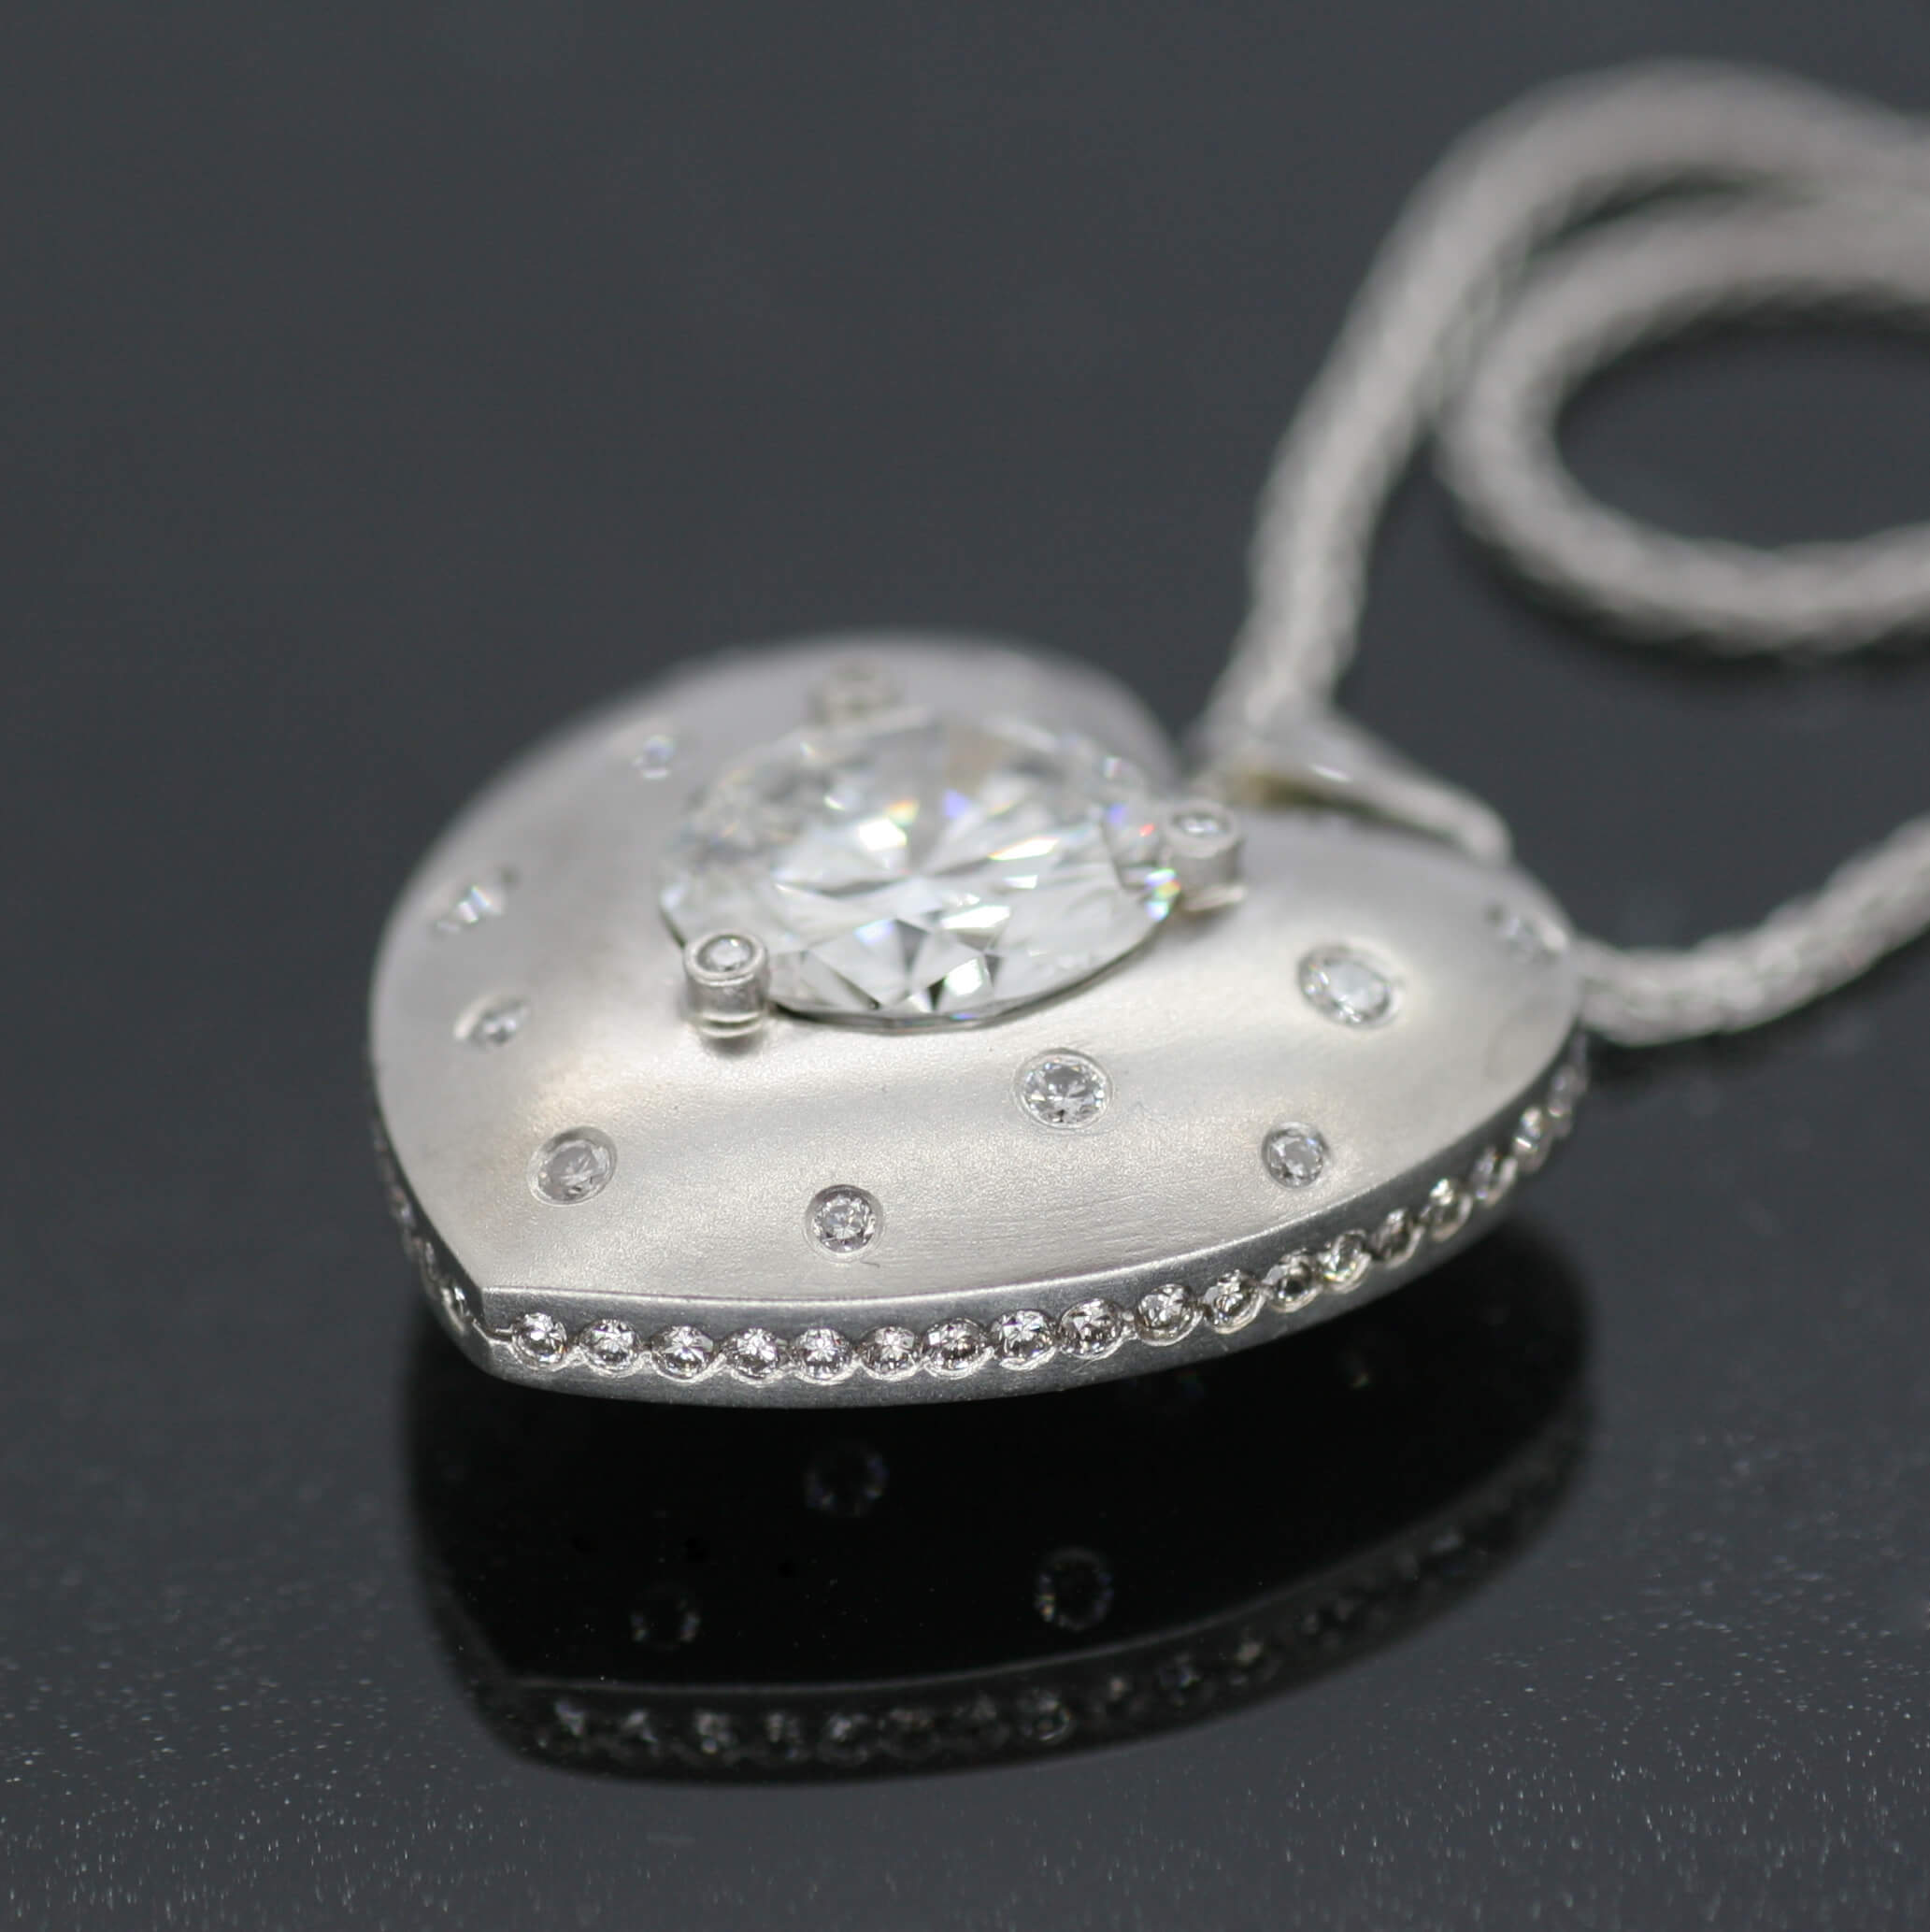 Bespoke Platinum and Diamond heart necklace on Platinum chain